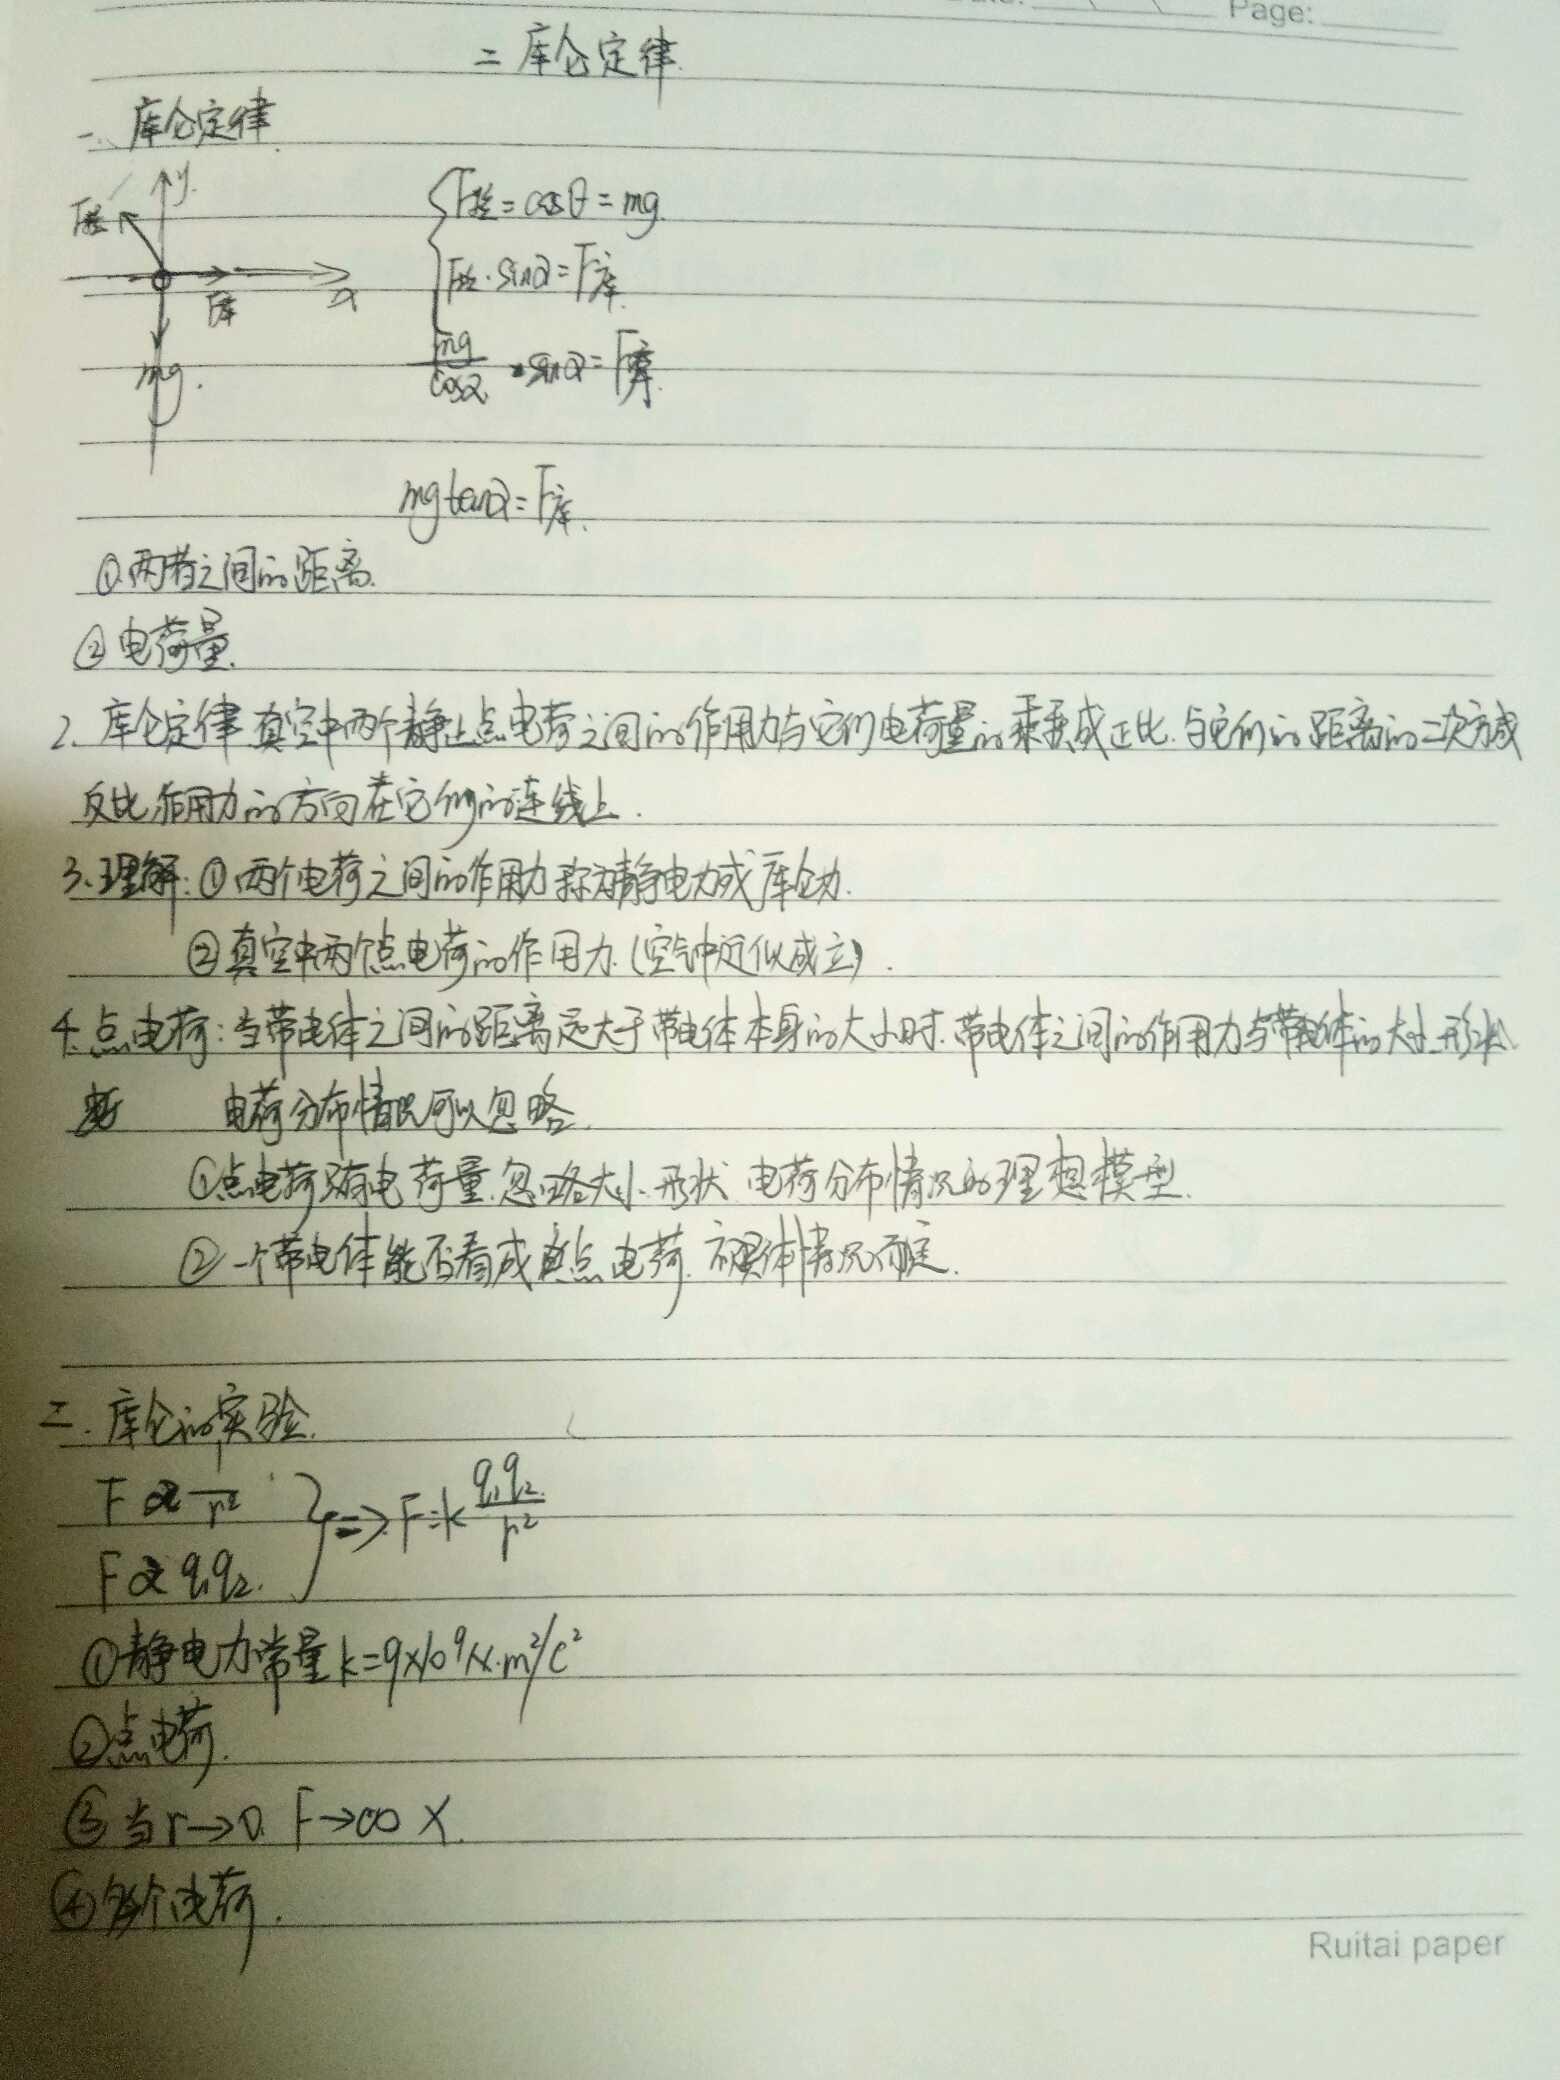 multi_image_20180407_225049.jpg